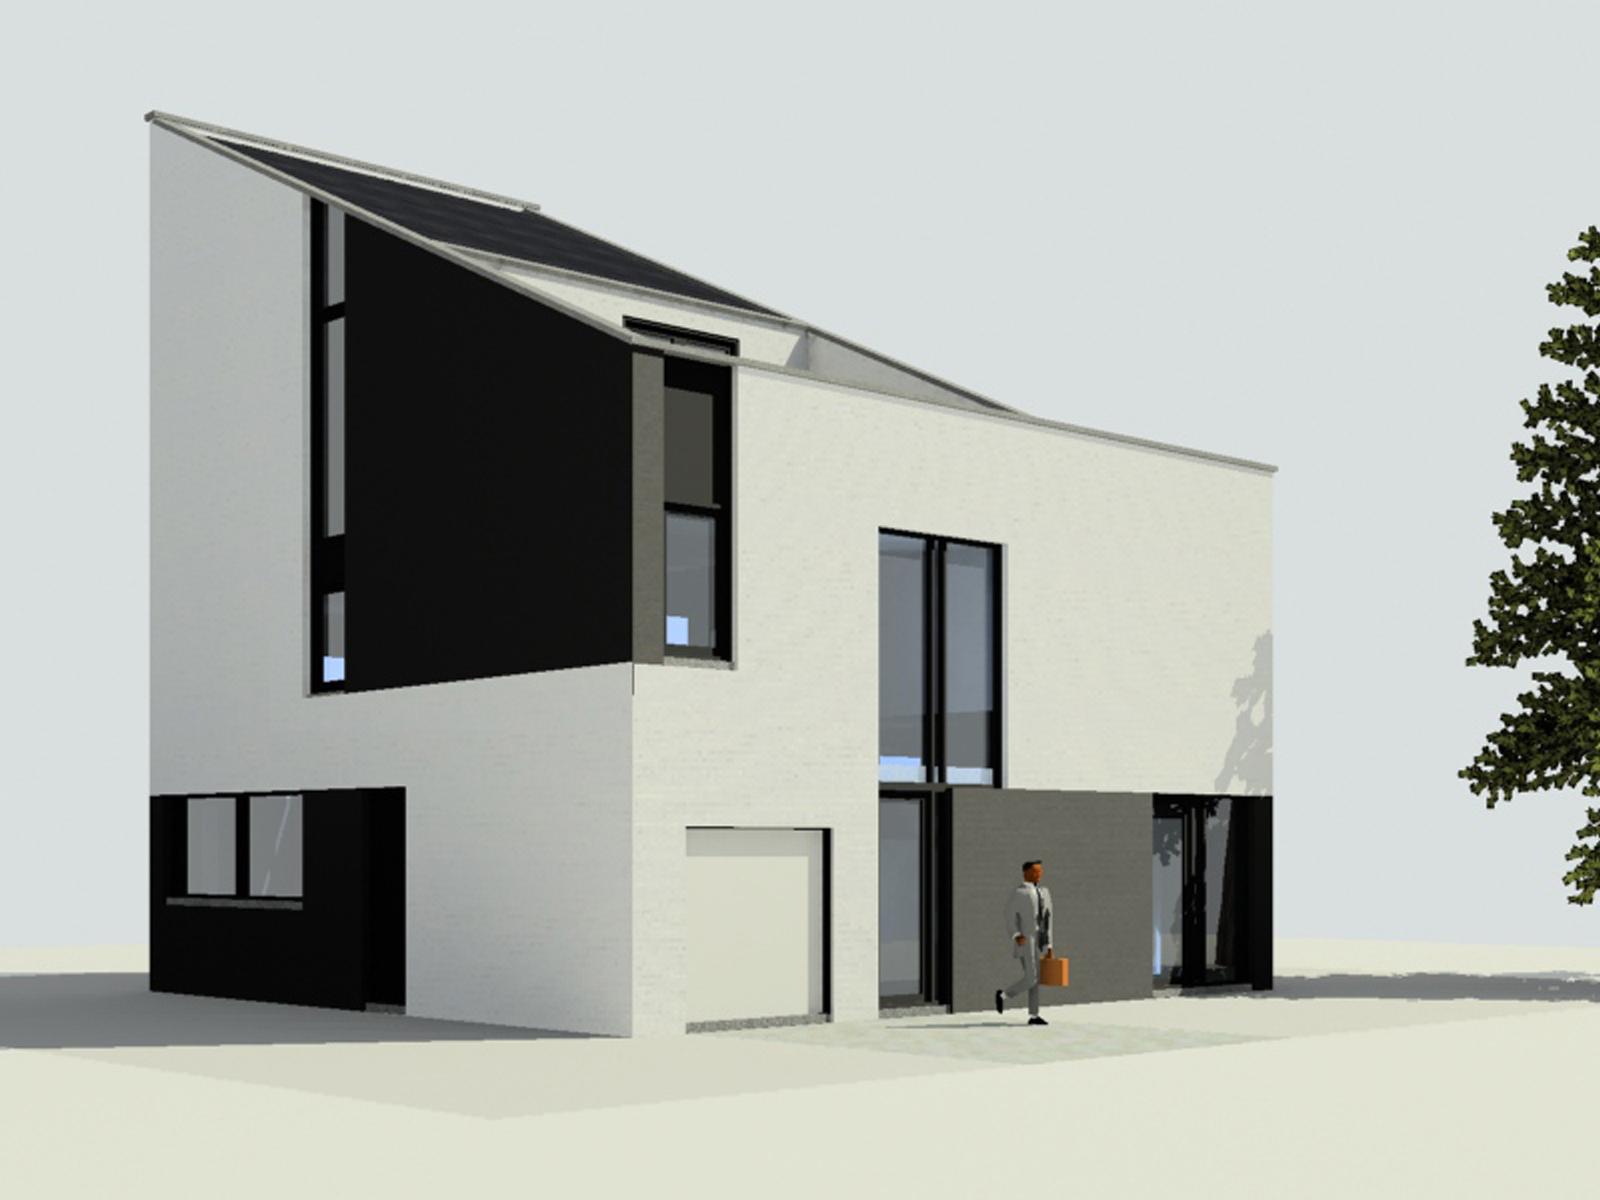 Nieuwbouw villa te Den Haag